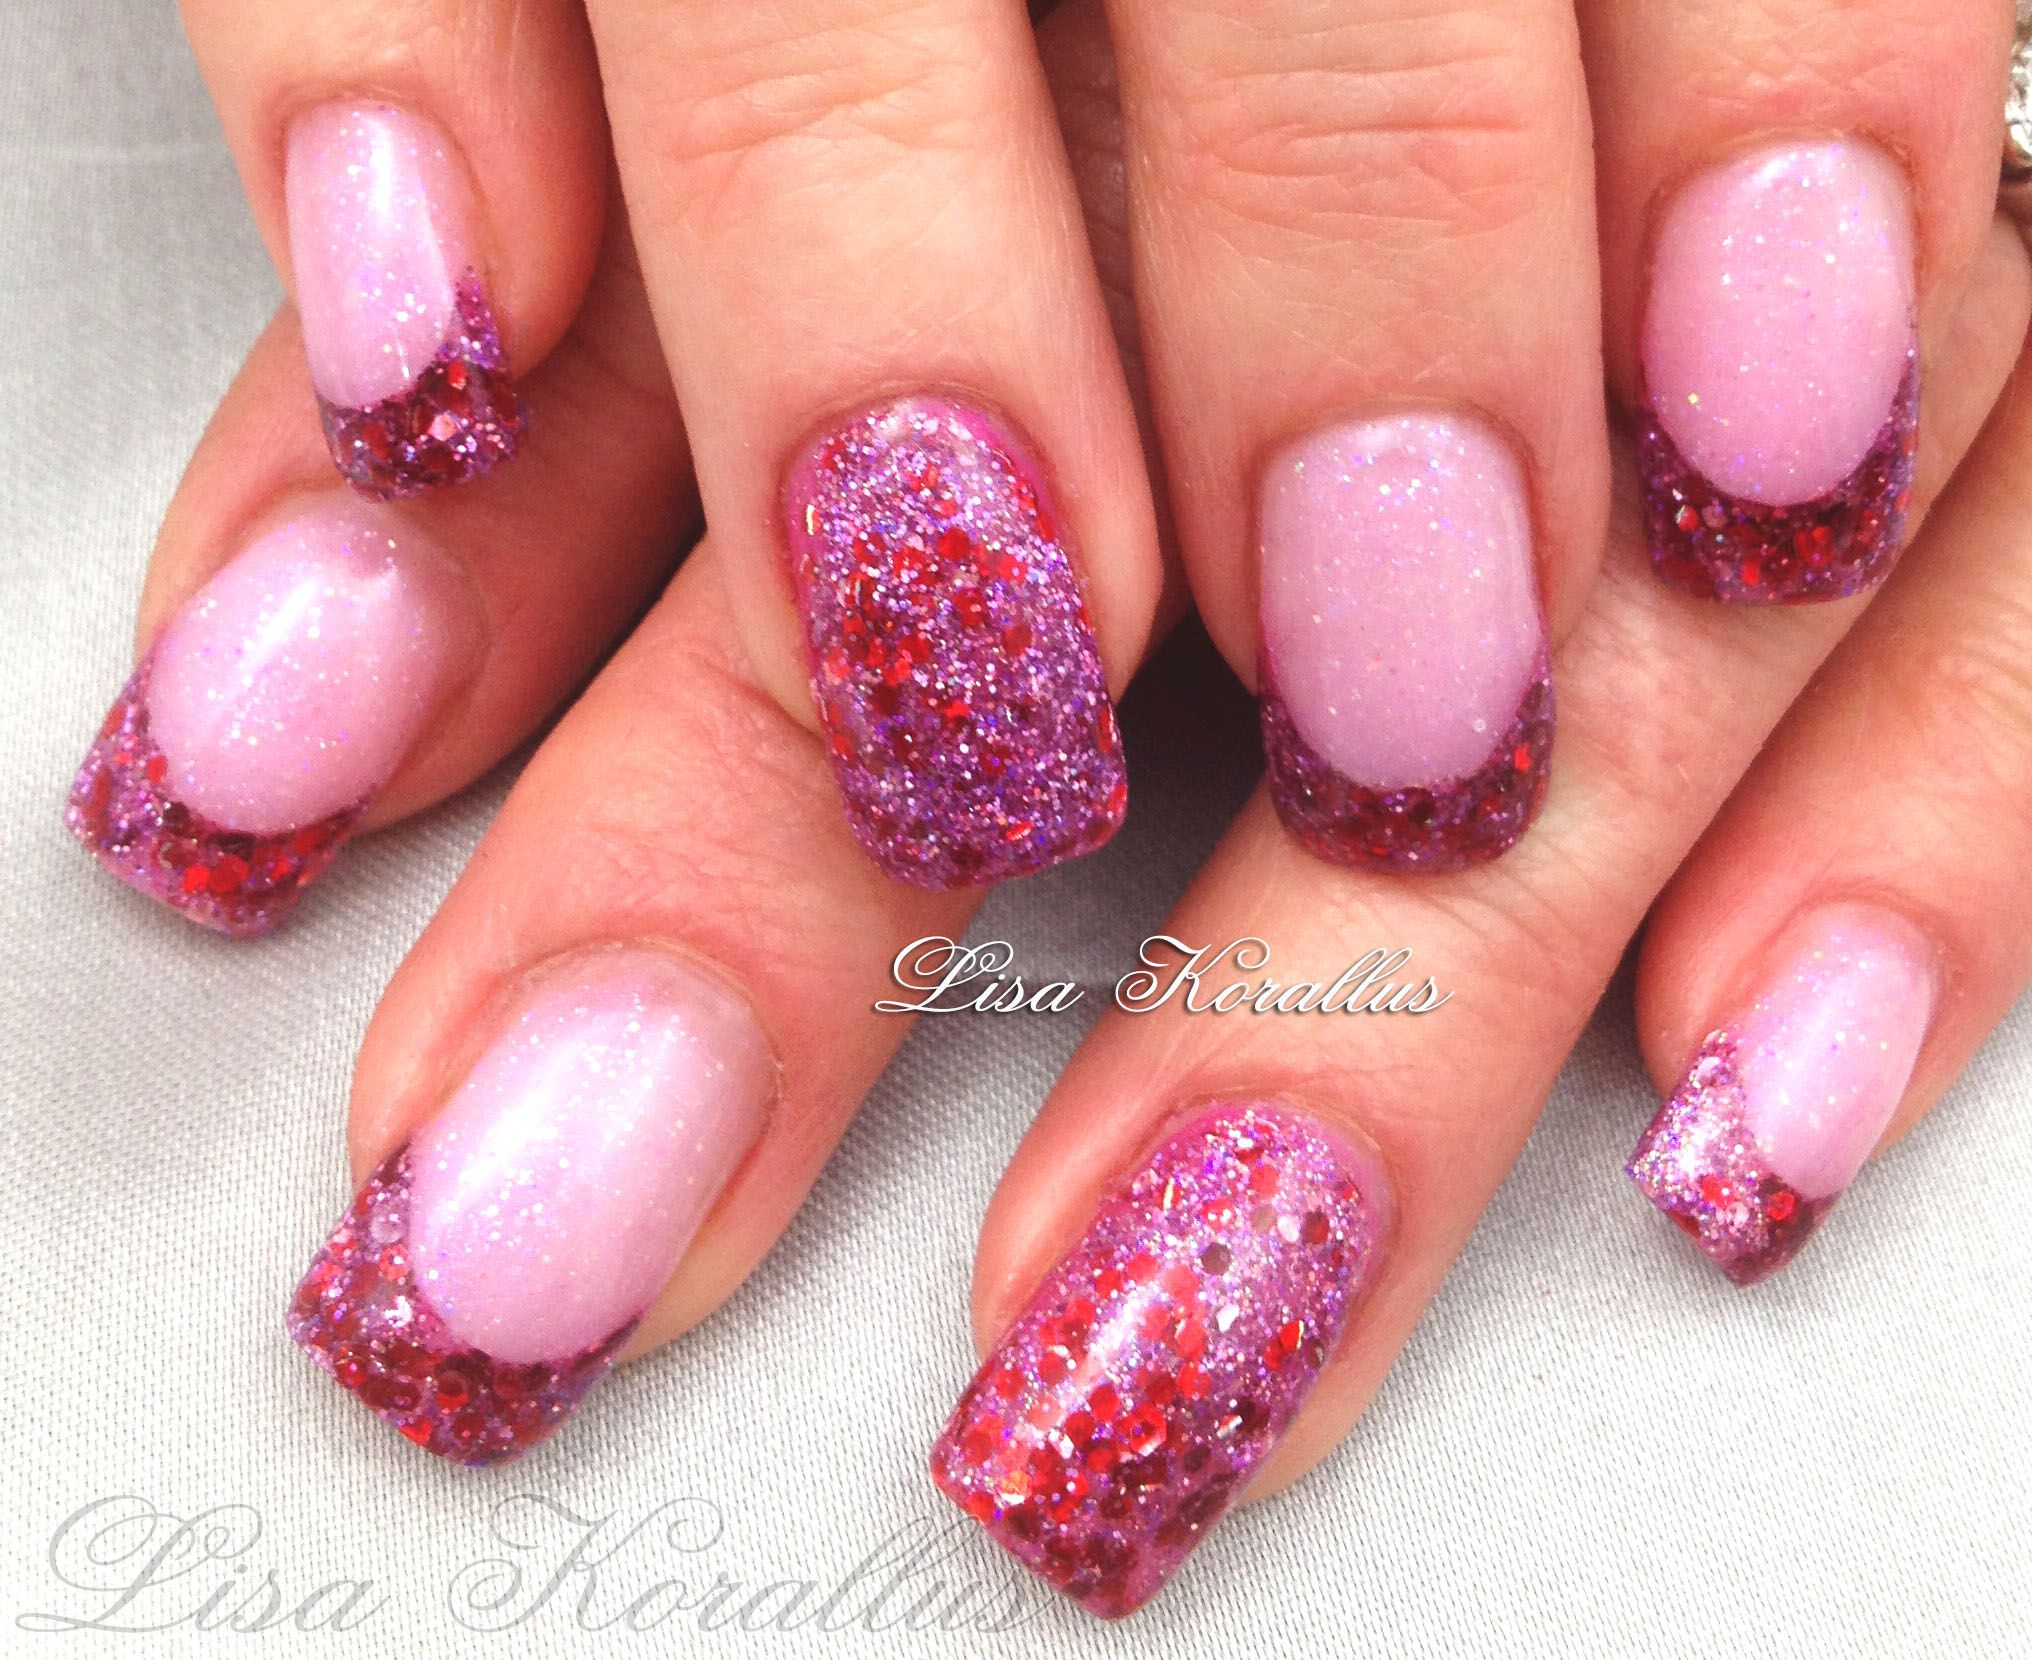 Sculpted pink and pink glitter gel enhancement.  #pinkandwhites  #frenchnails #gelnails #nailart #handpaintednails #naildesign #nails #lisakorallus #liquidglamour #nailpictures #nailsofpinterest